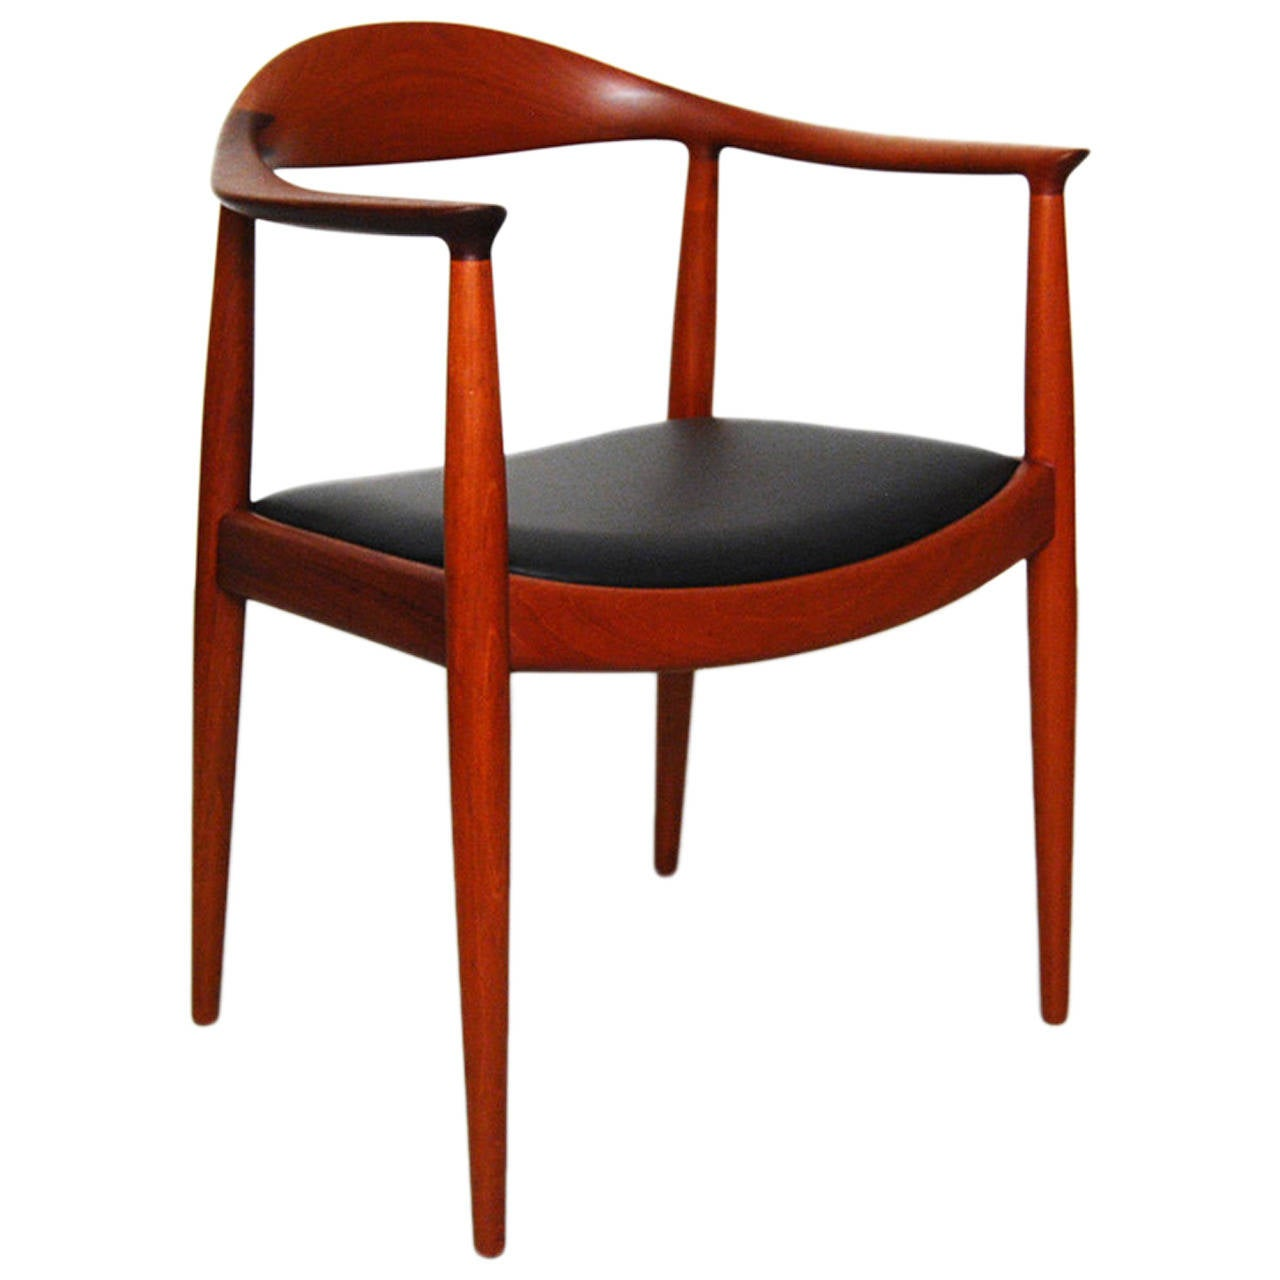 "Hans Wegner ""The Chair"" at 1stdibs"